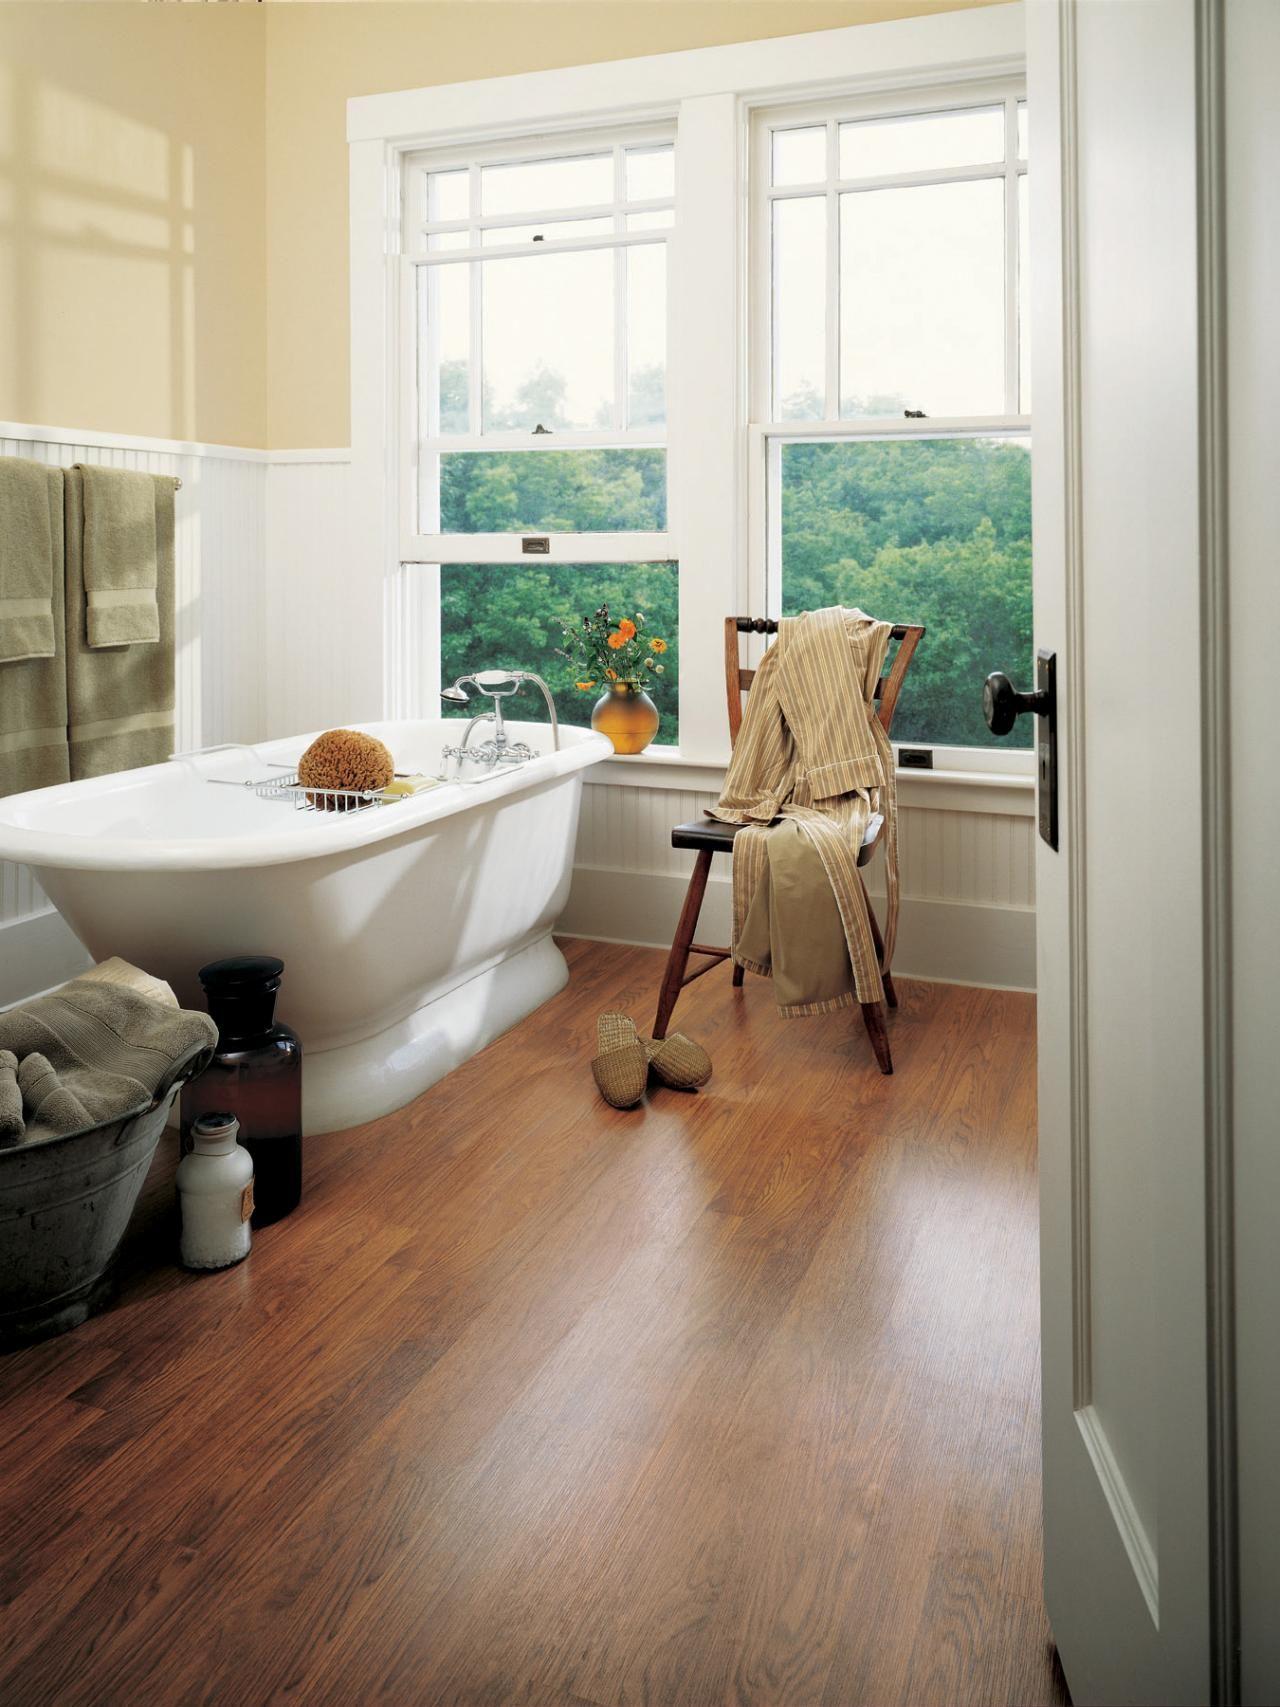 Web Photo Gallery Floor Choosing Bathroom Flooring Design Choose Floor Plan Laminate Bathroom Wall And Floor Materials Bathroom